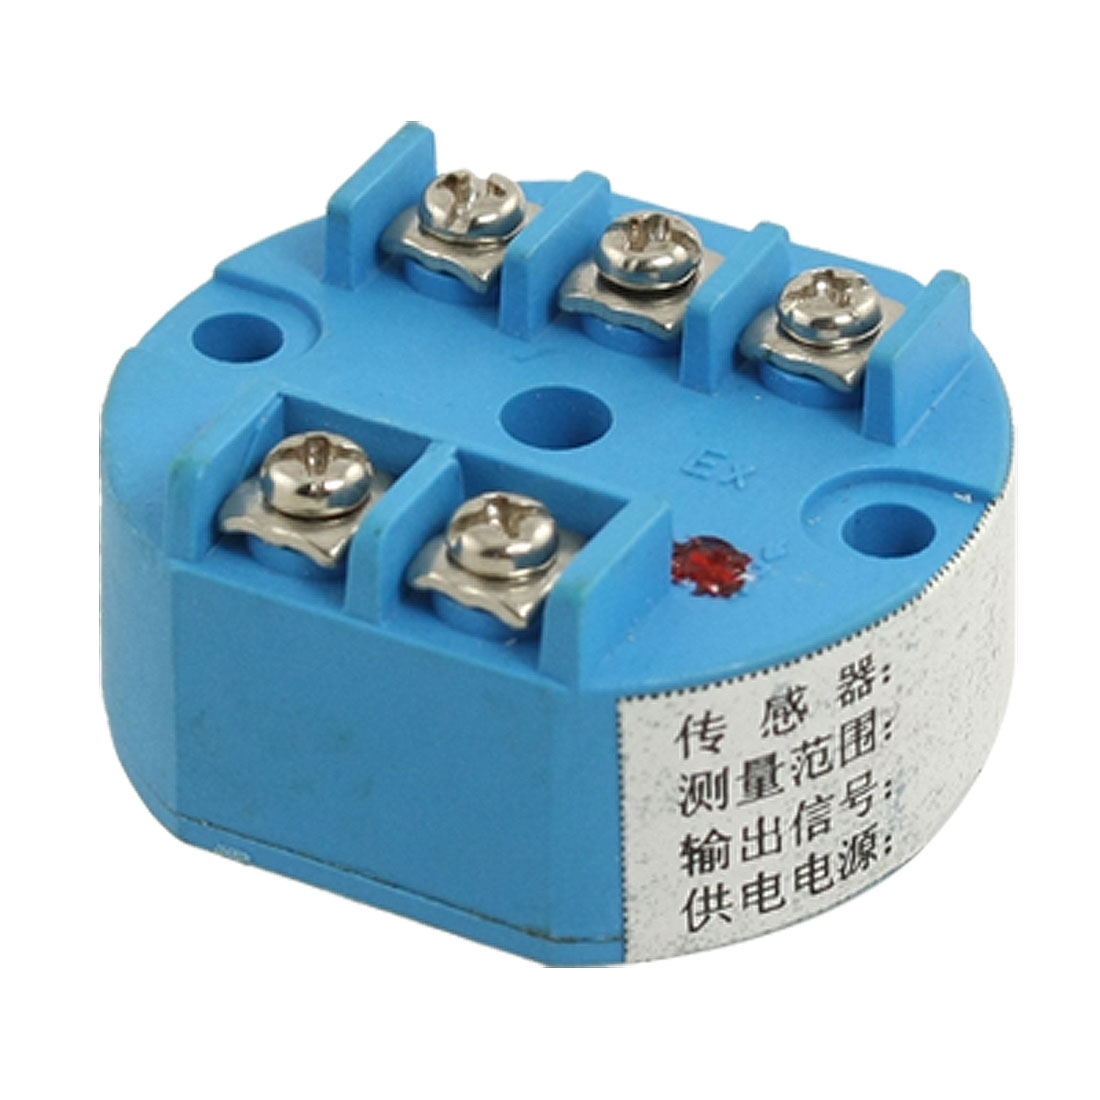 PT100 Temperature Sensor Transmitter 0-100C 24V DC 4-20mA Output